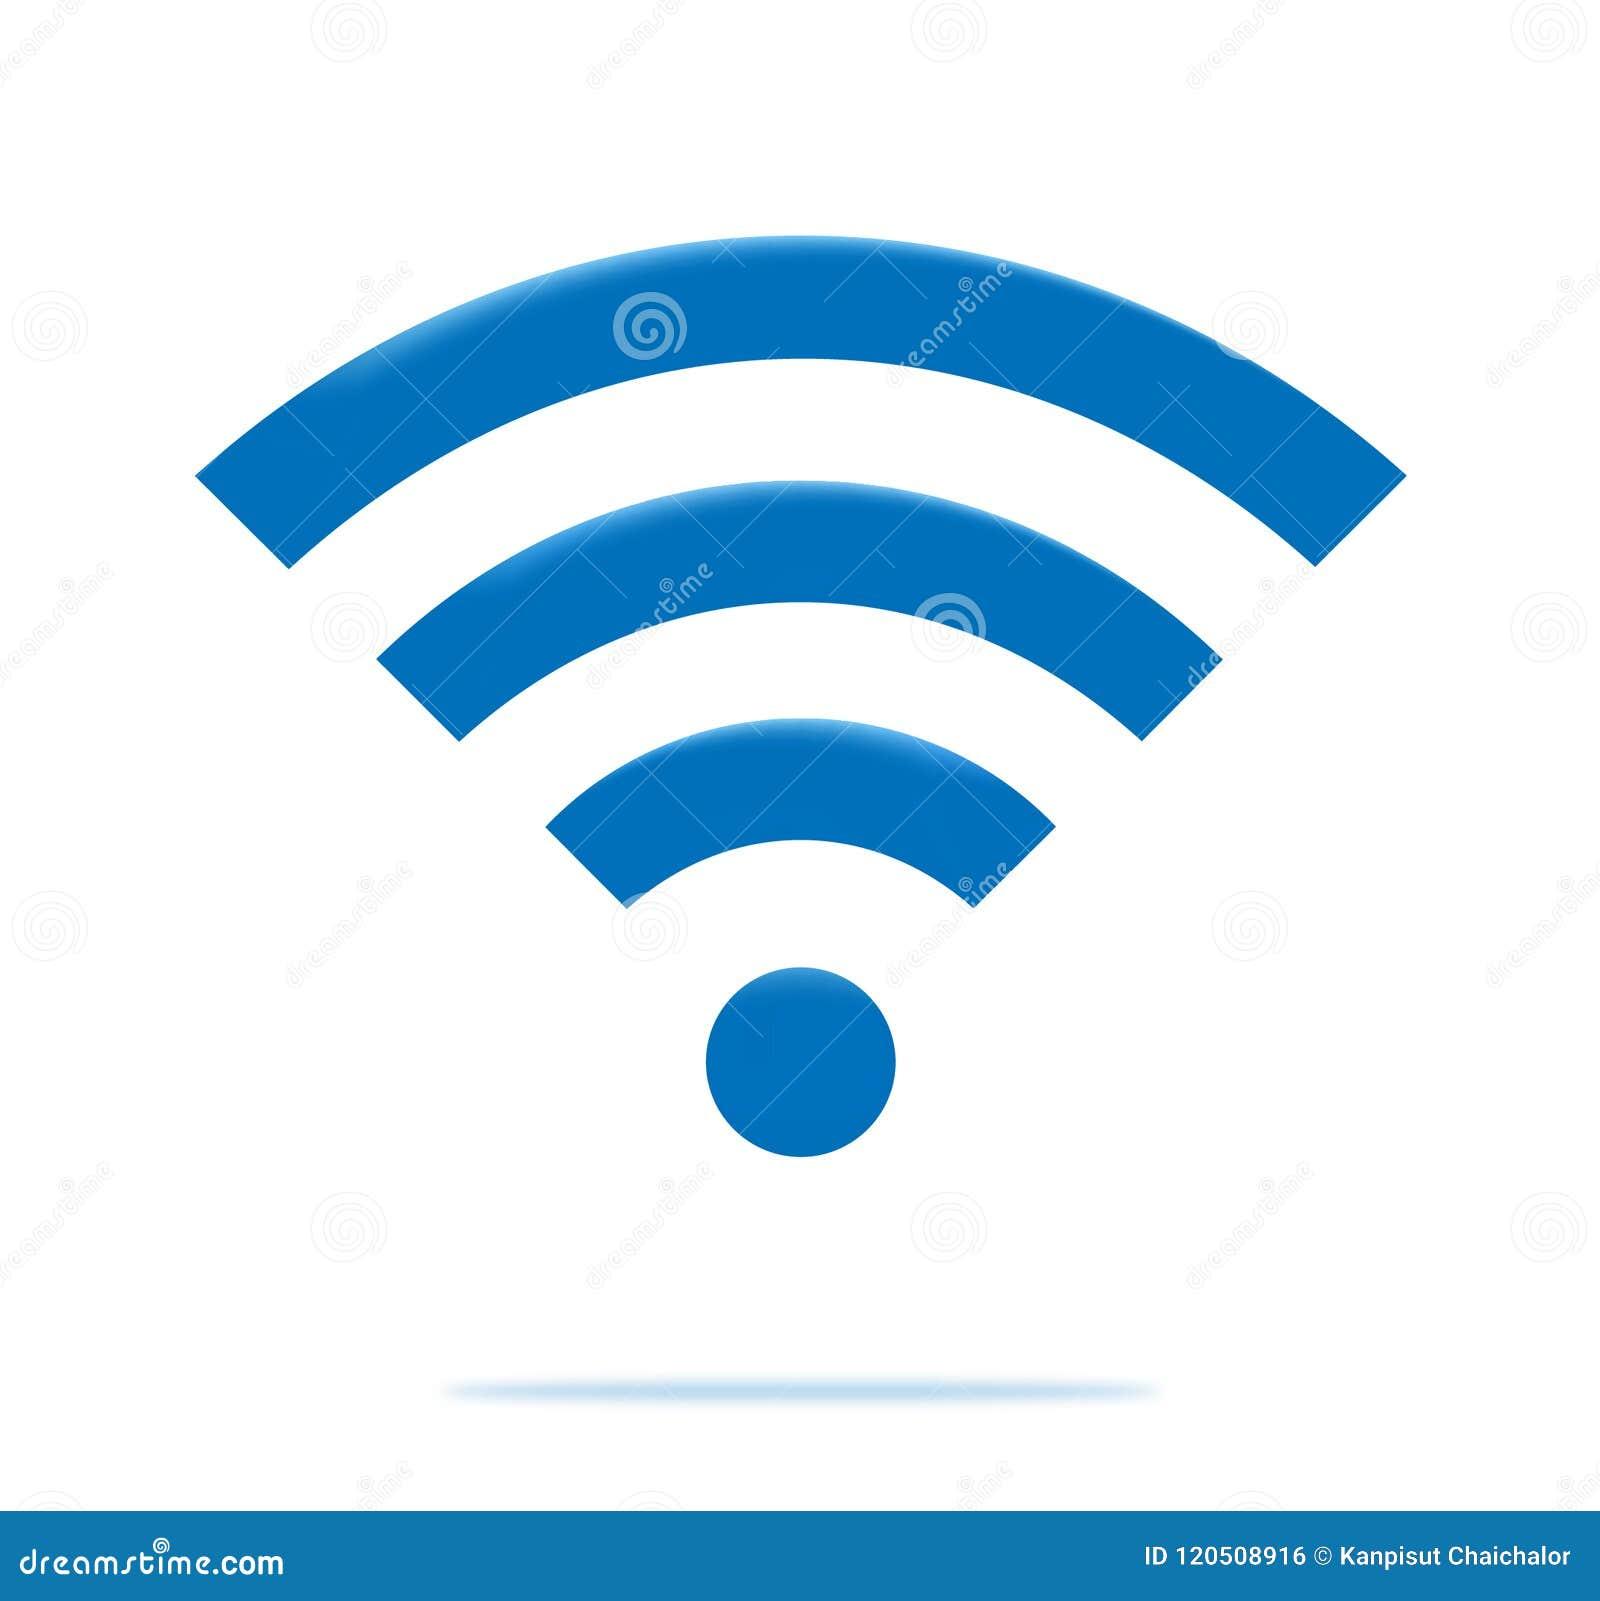 Icônes de radio et de wifi Icône de wifi de symbole de réseau sans fil  Vecteur de radio et de wifi 7fdab79ac409